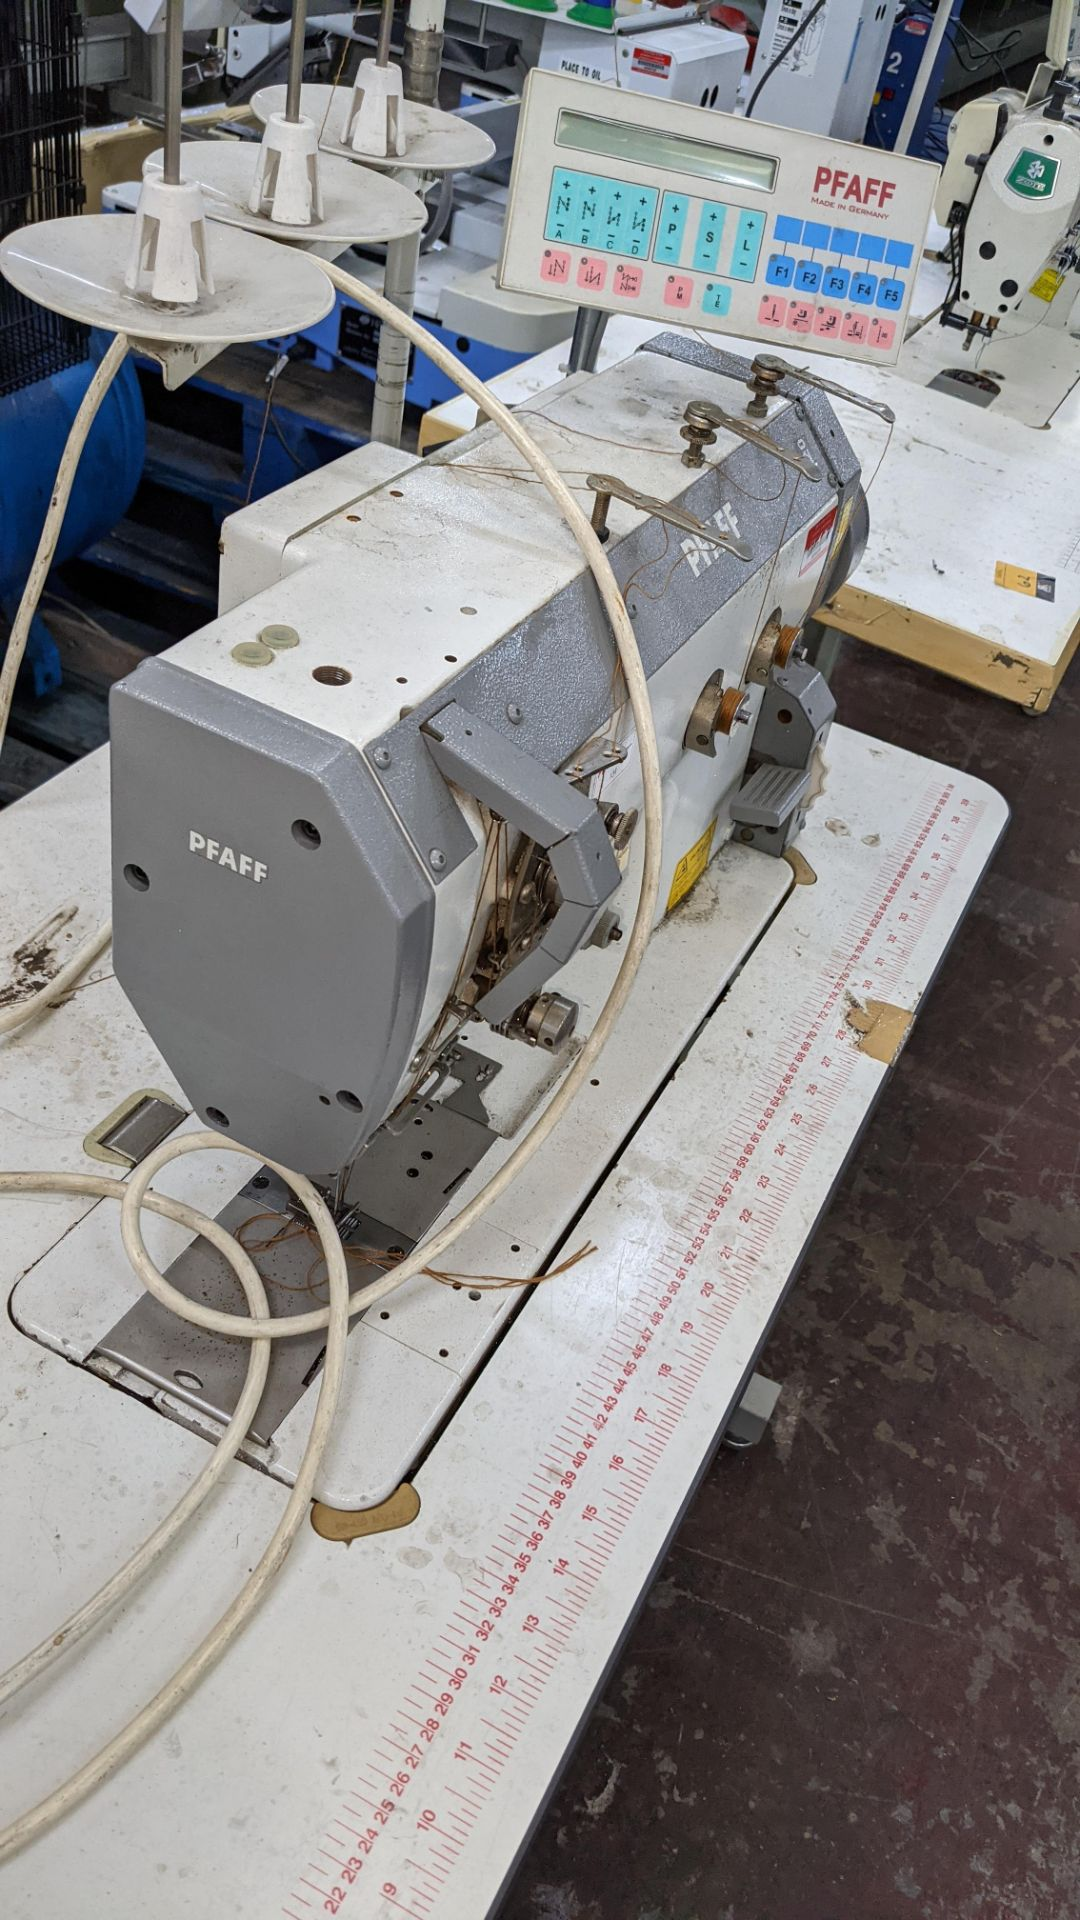 Pfaff twin needle sewing machine, model 422 - Image 10 of 17